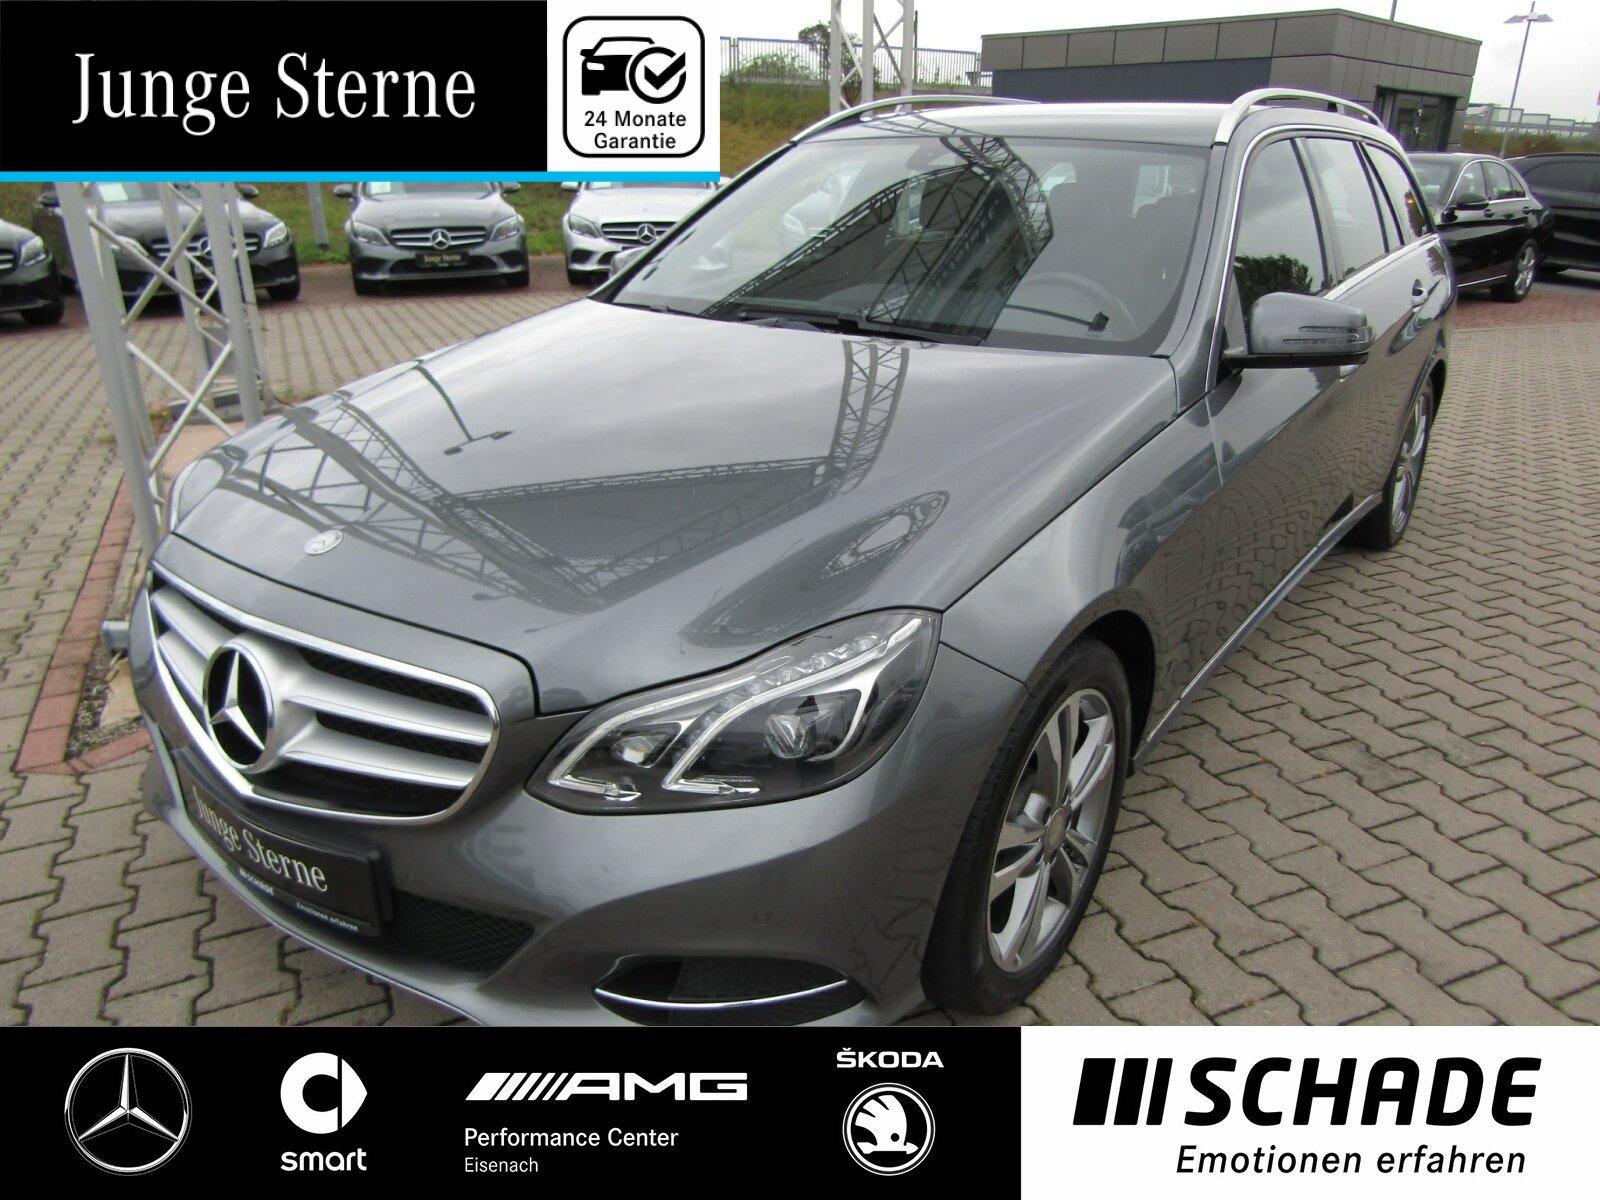 Mercedes-Benz E 220 T BT Avantgarde Navi*LED*Sitzhzg.*Parksen., Jahr 2015, Diesel